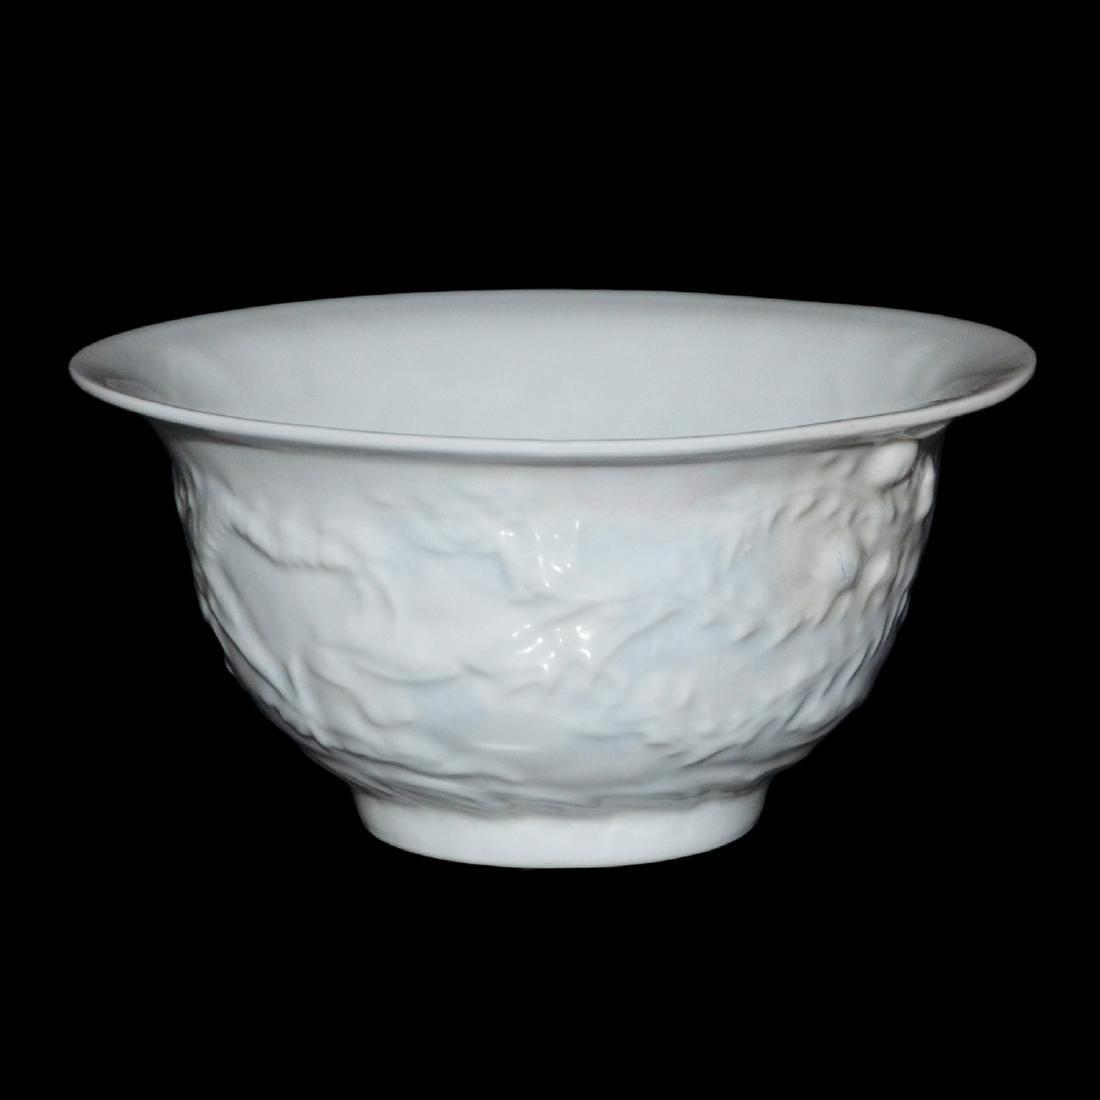 Ming Dynasty, White-Glazed Anhua Inside Decorated - 3